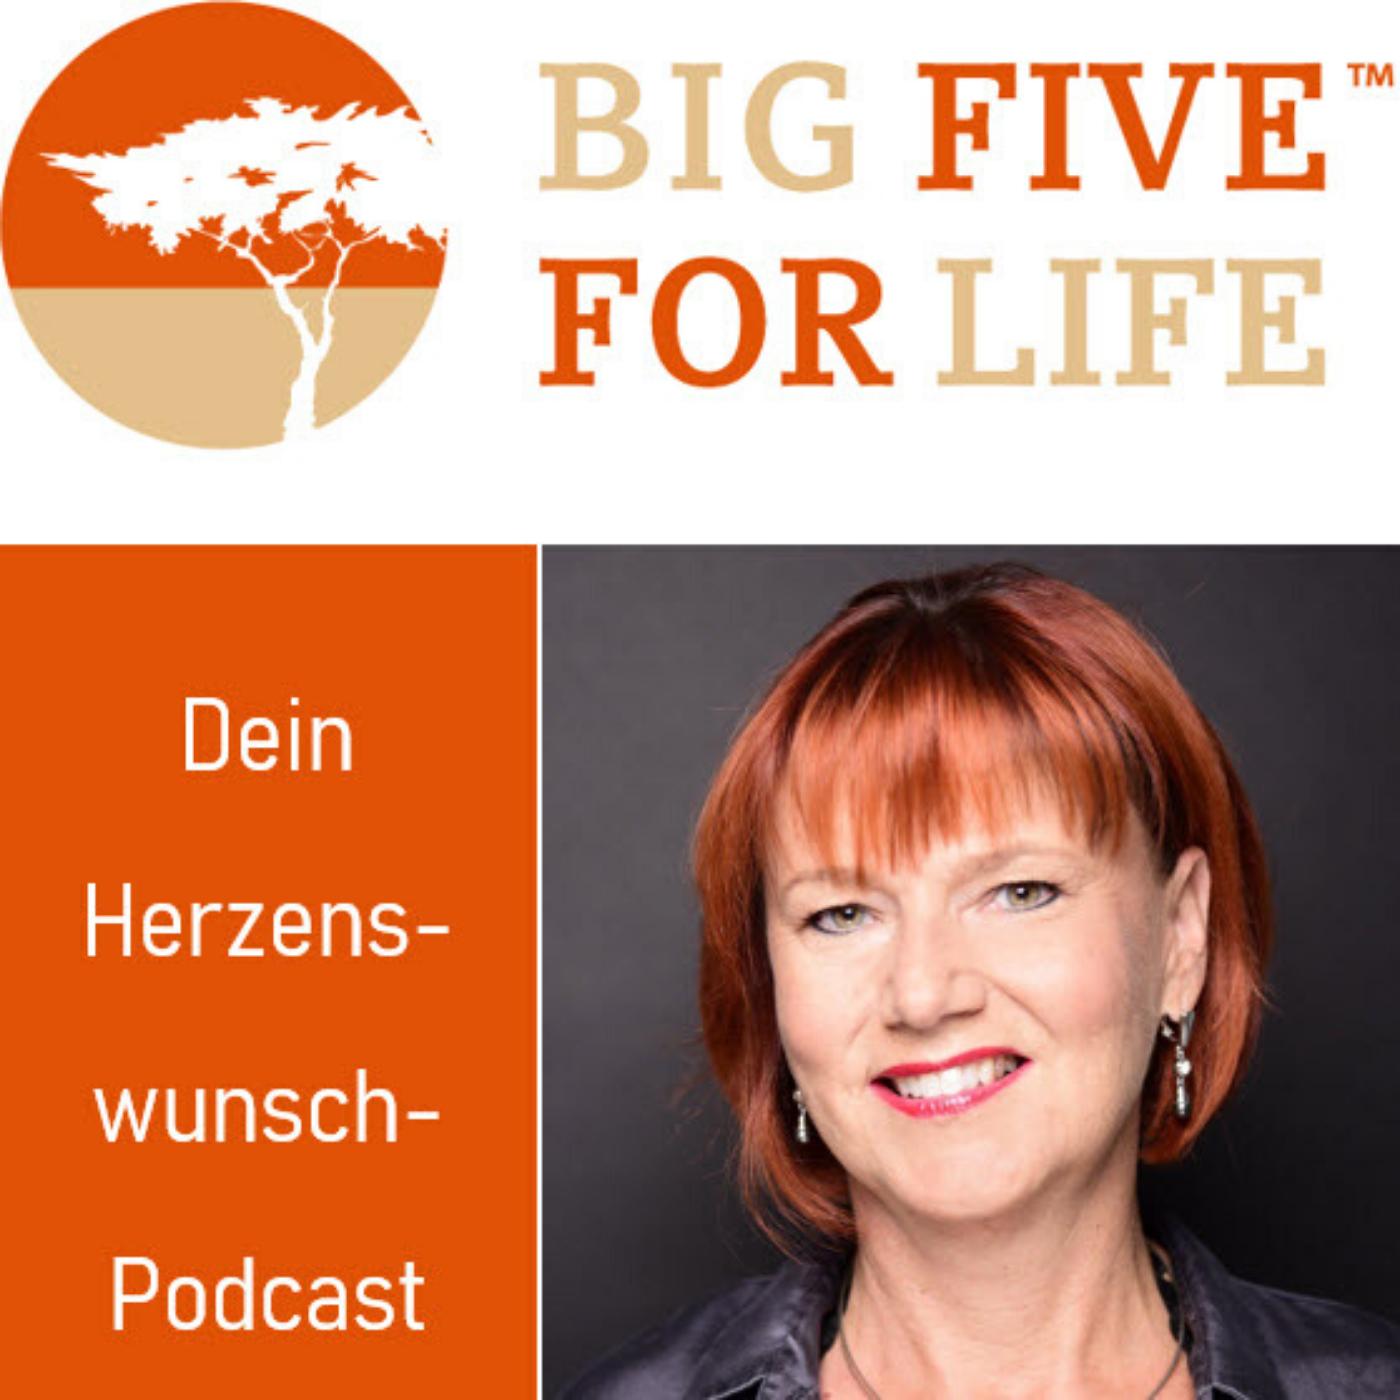 BIG FIVE FOR LIFE - DEIN HERZENSWUNSCHPODCAST show art